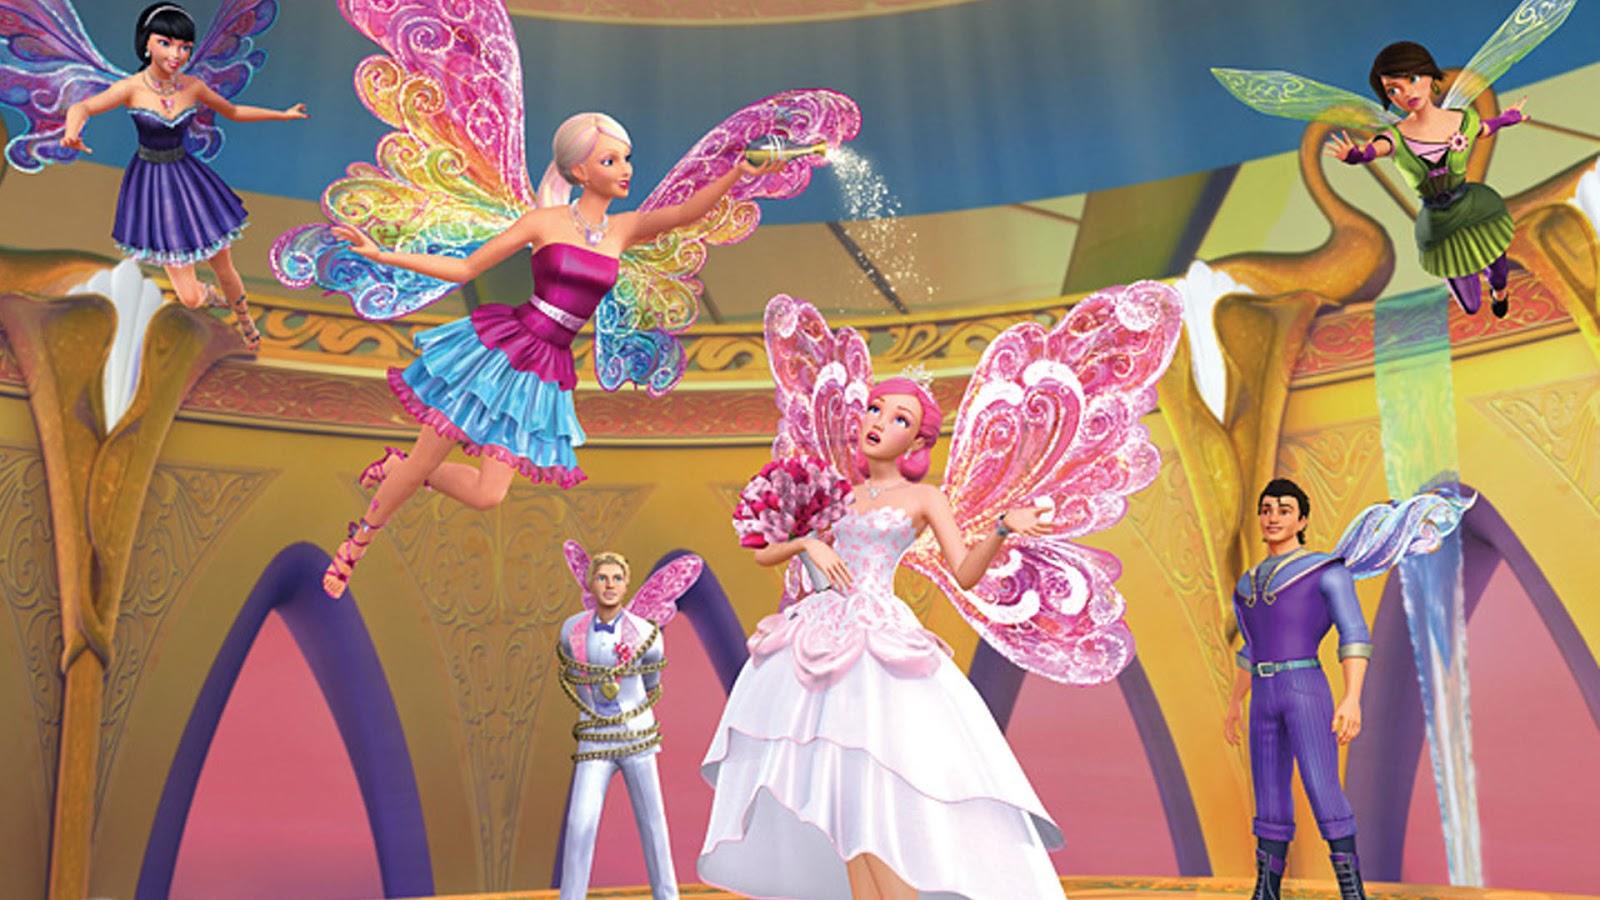 http://2.bp.blogspot.com/-H3vkuThixWc/Tru9iRLqjNI/AAAAAAAAAwc/wHdJr4k-V-I/s1600/Barbie-a-fairy-secret-original.jpg